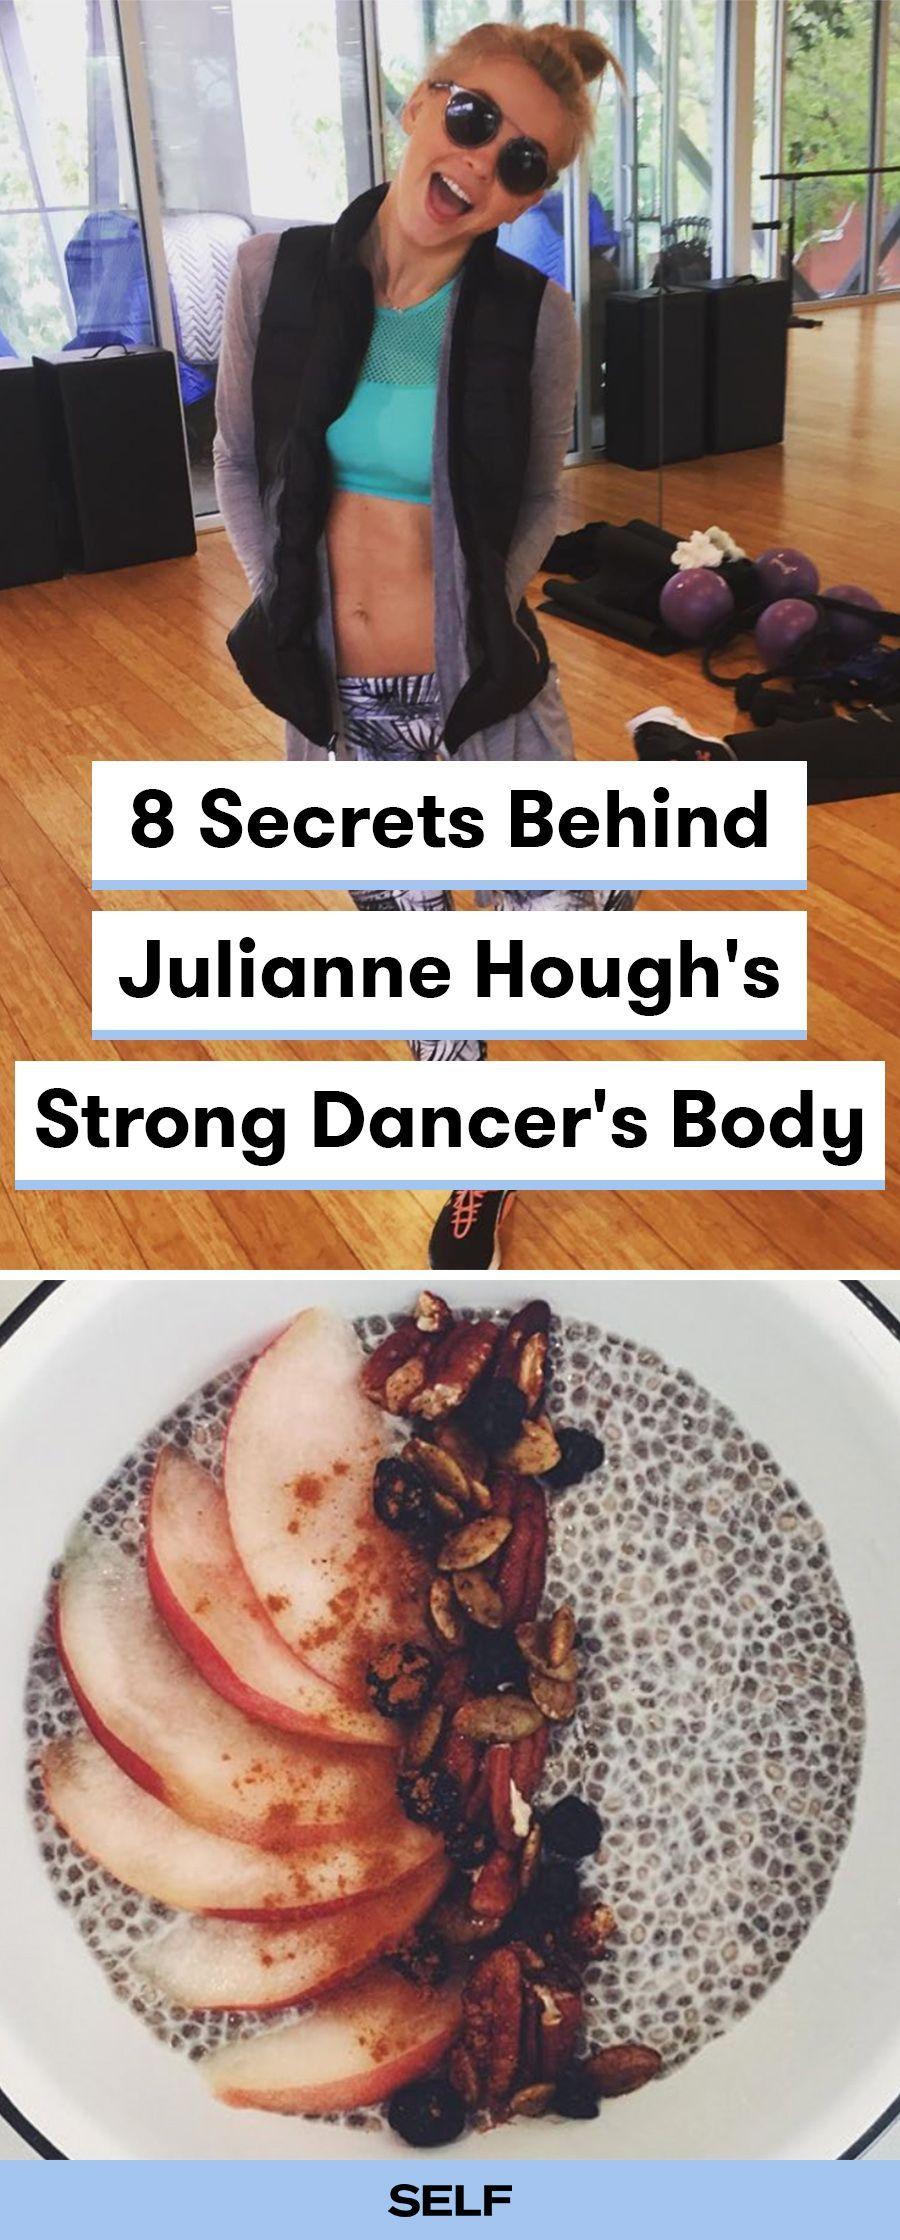 Julianne Hough Diet : julianne, hough, Julianne, Hough, Loves, Healthy!, Here's, Julianne's, Exercise, Routine, Str…, Dancer, Diet,, Dancers, Body,